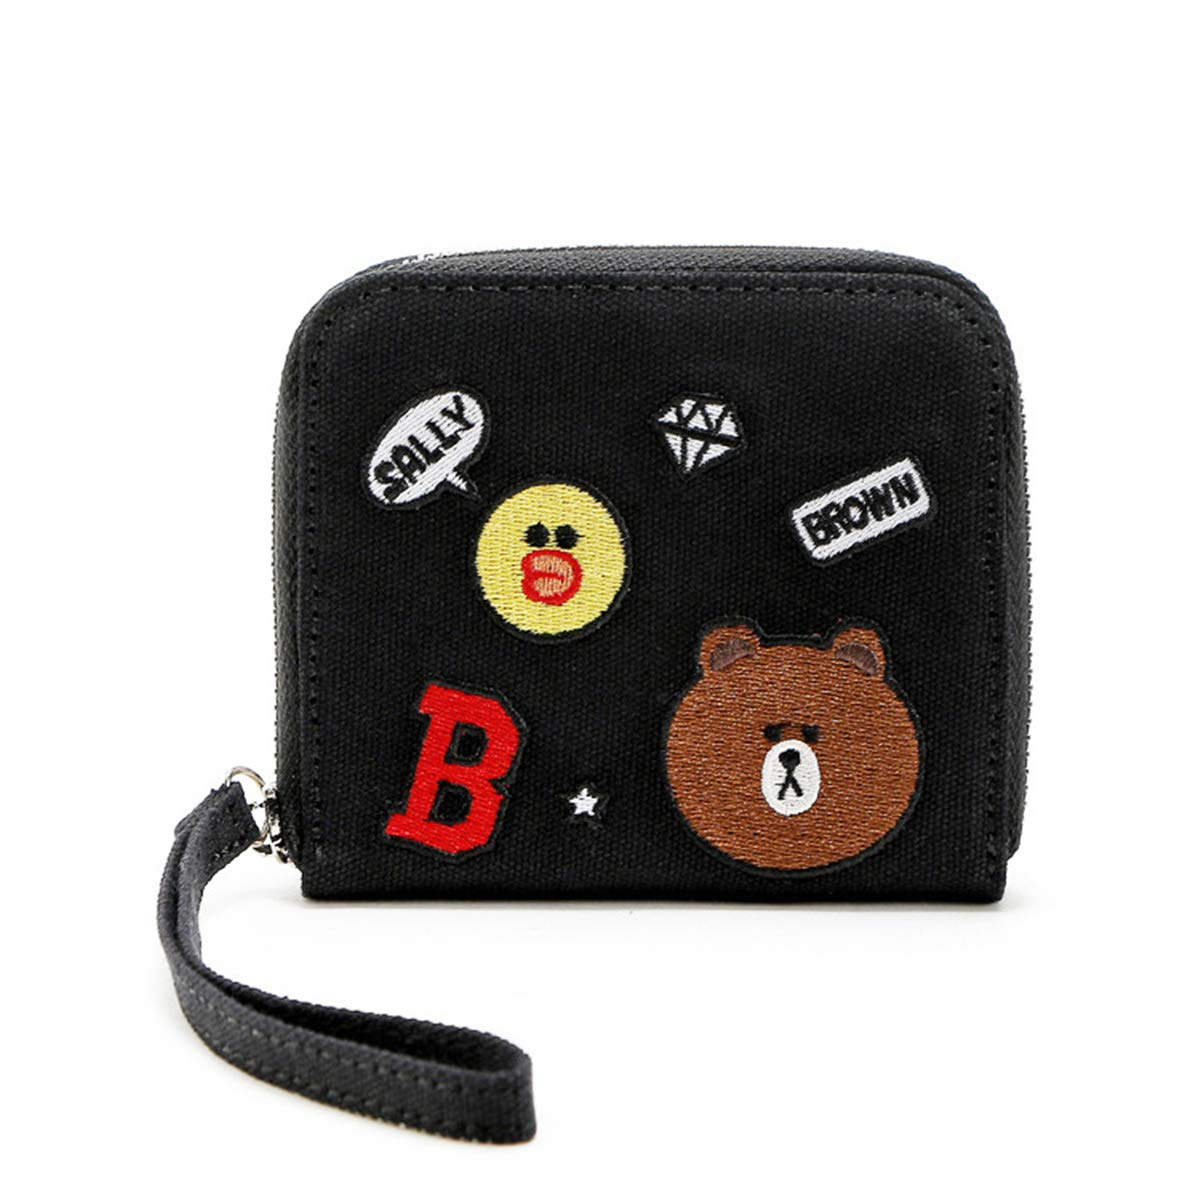 Small RFID Wallet RFID Blocking Ladies Wallet Top Quality Leather